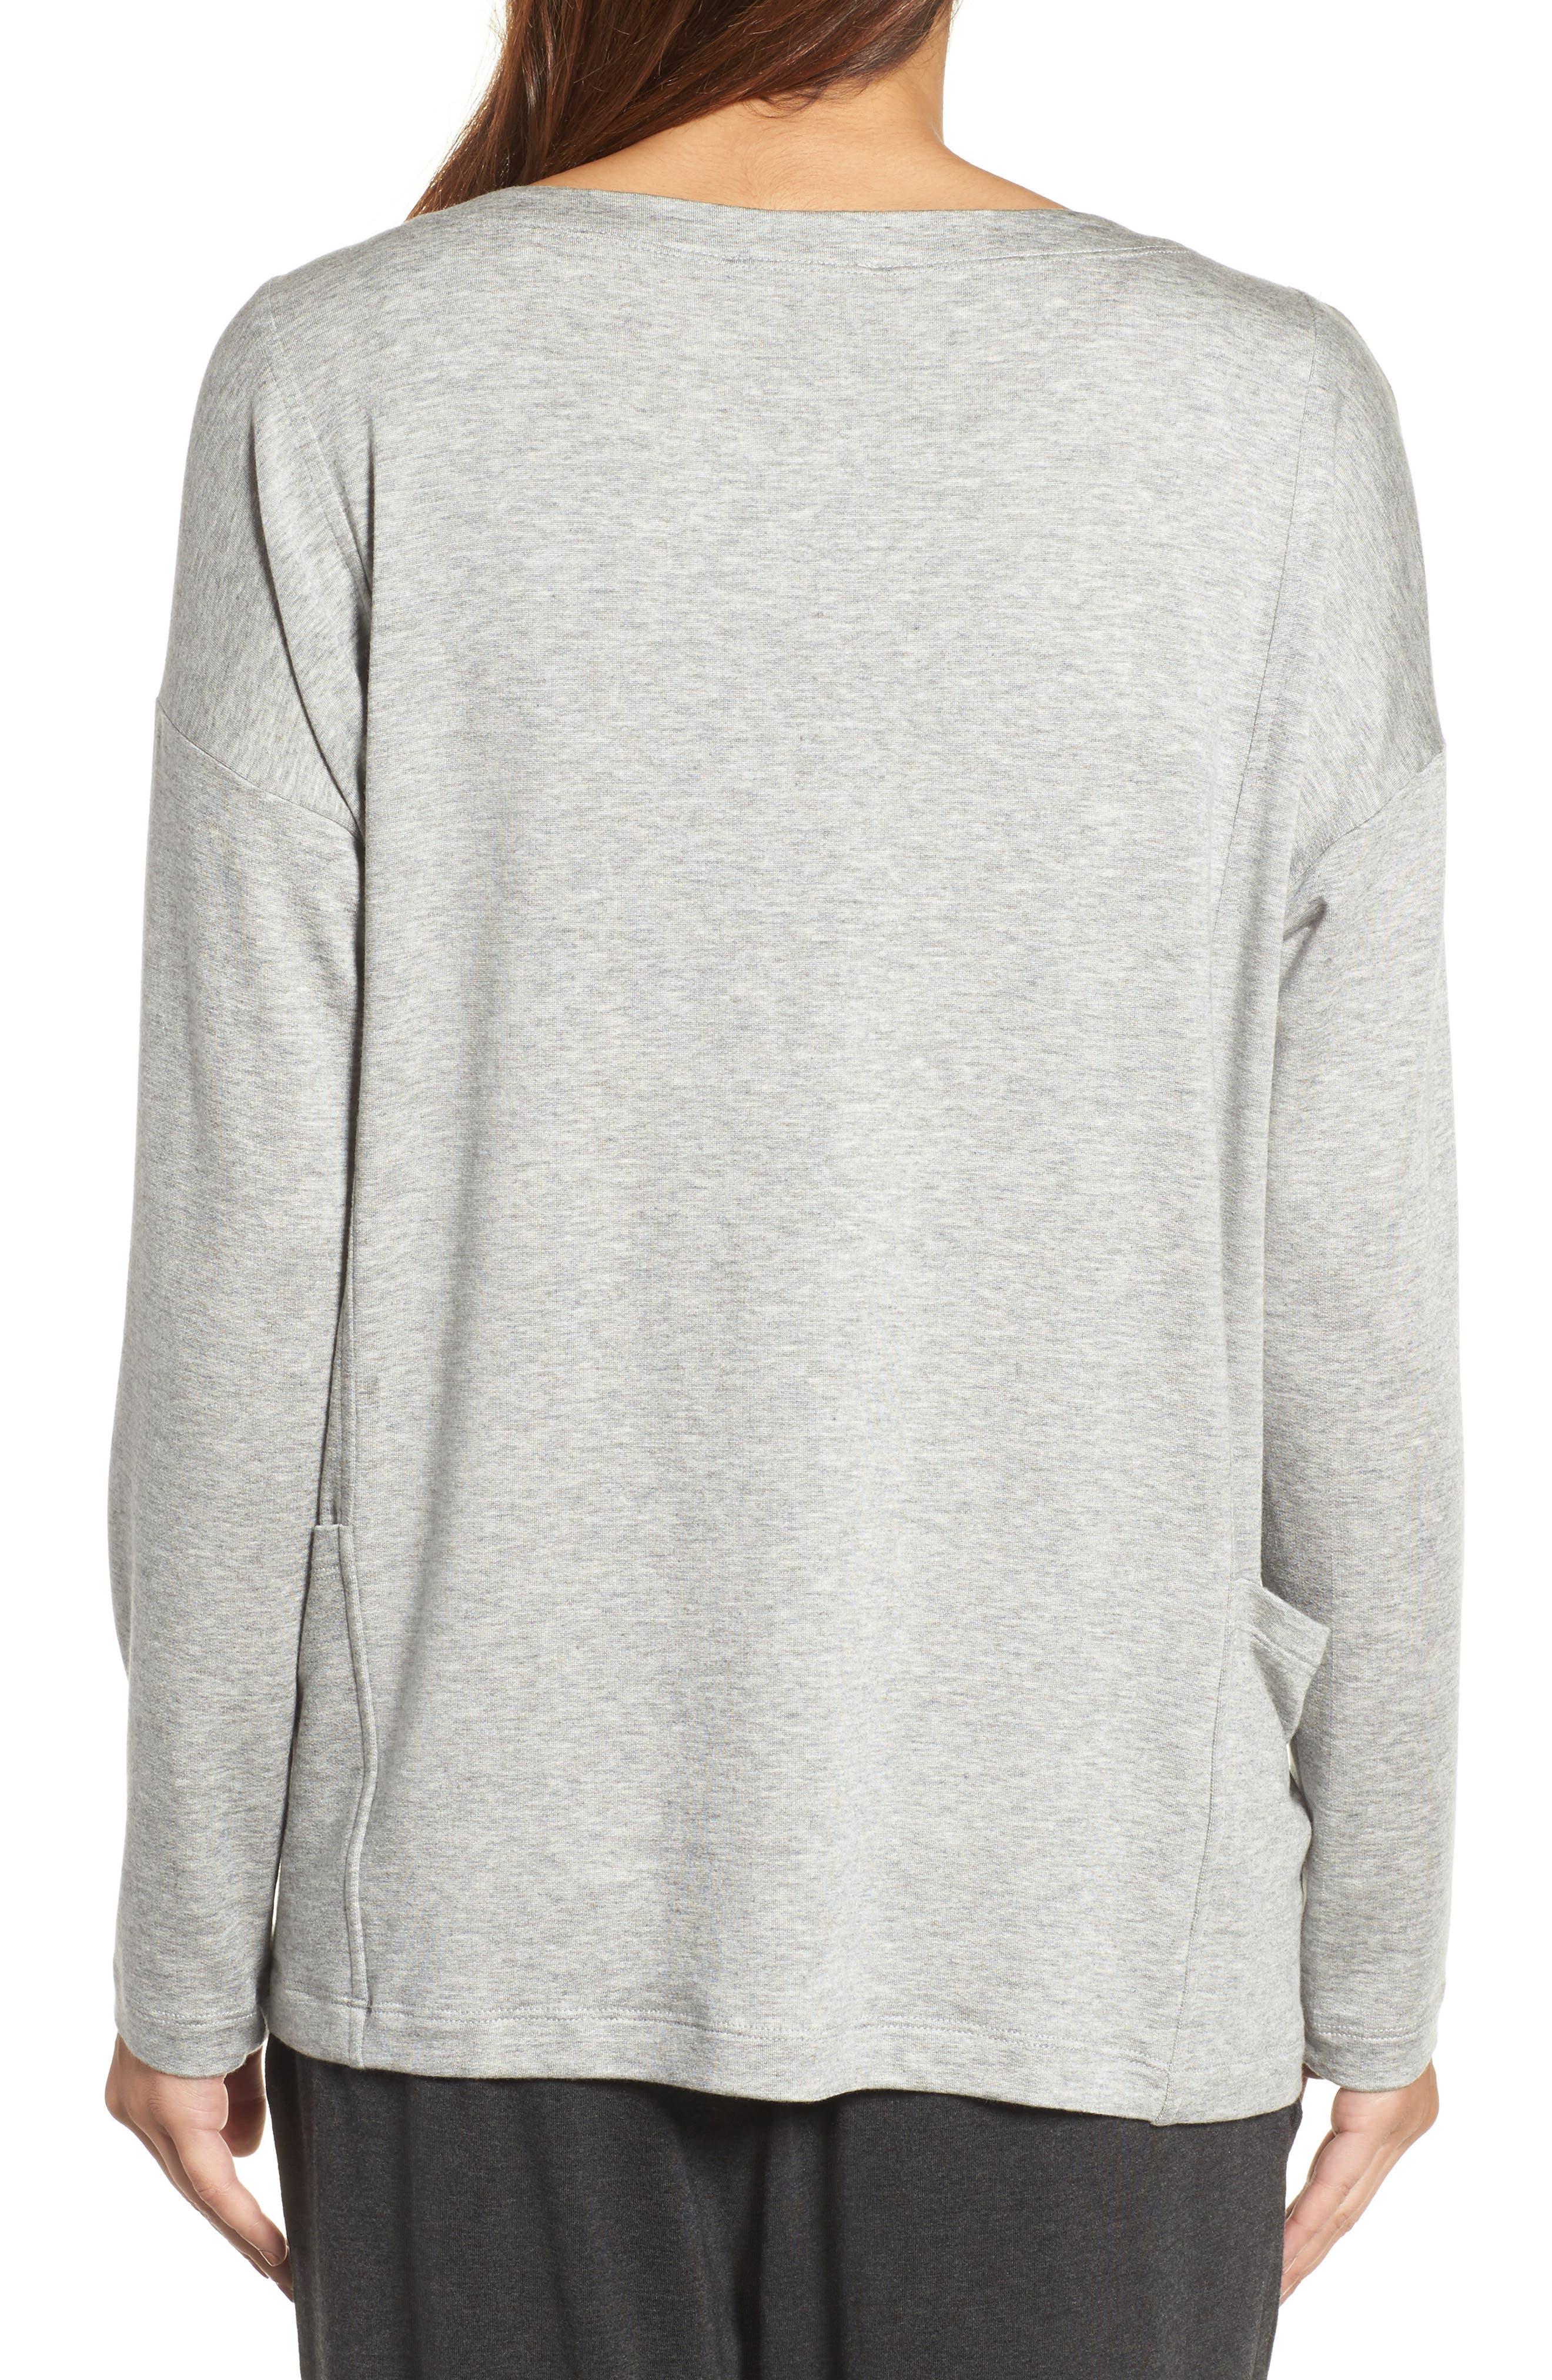 Alternate Image 2  - Eileen Fisher Bateau Neck Sweater